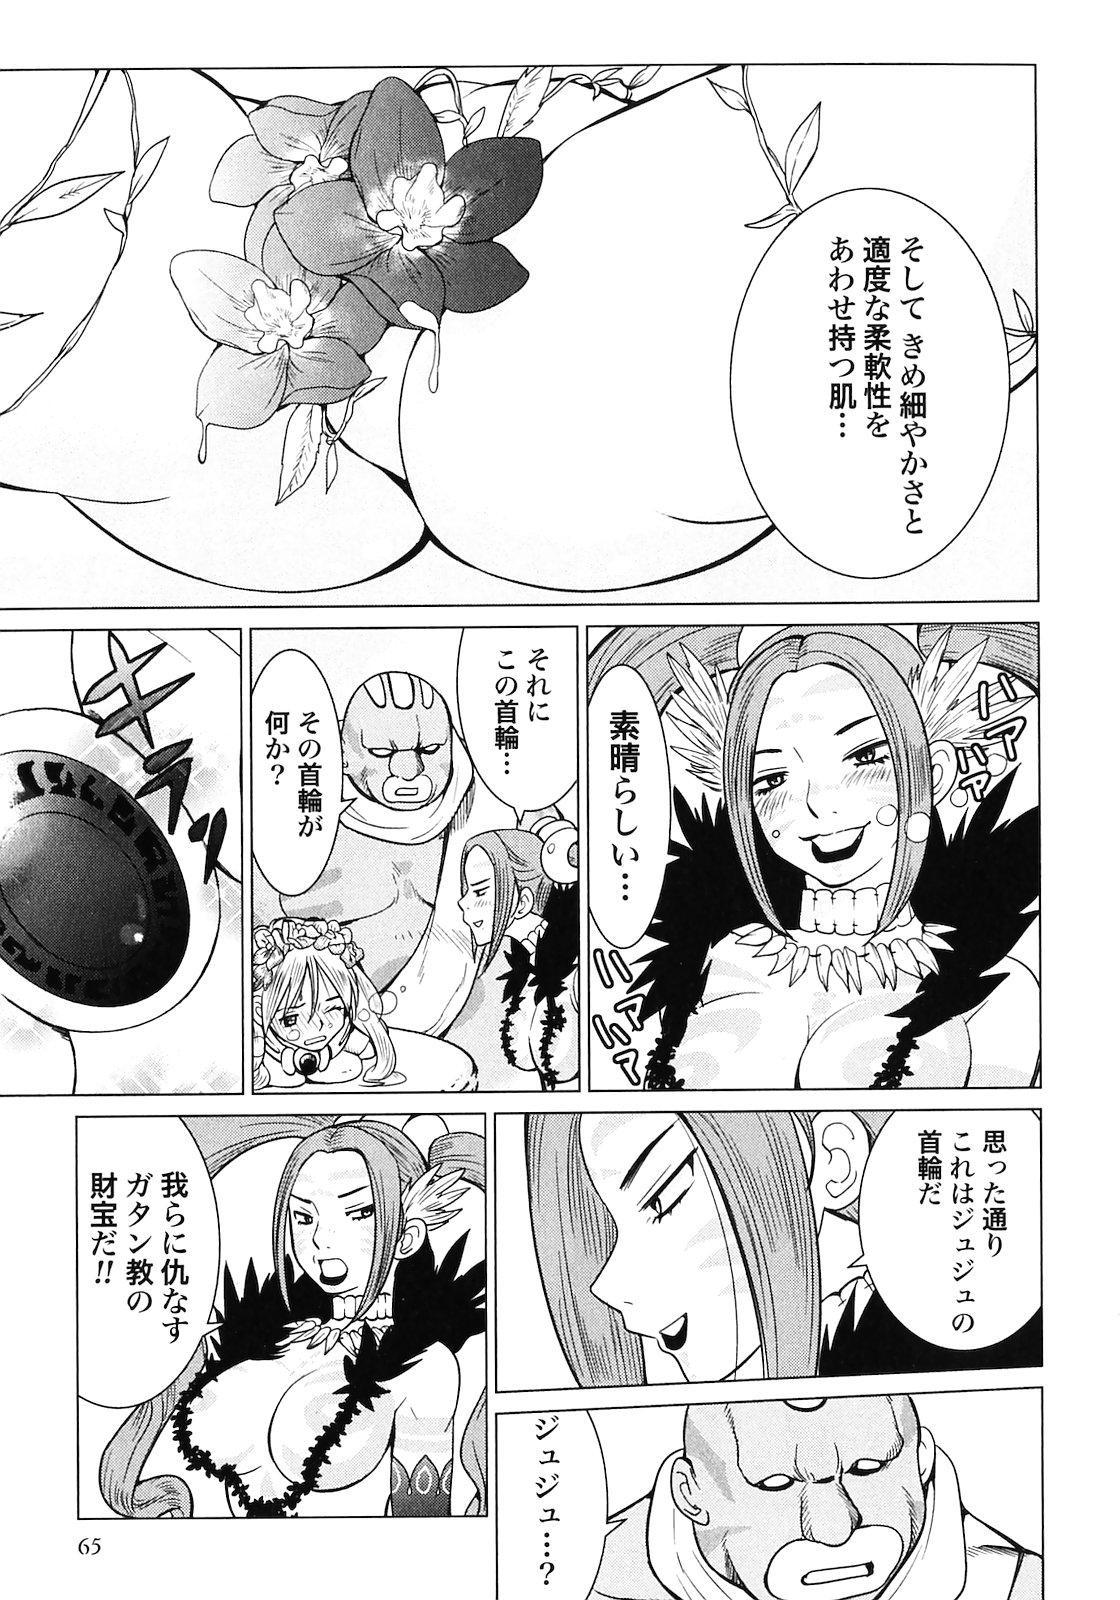 Makyo no Shanana Vol.02 66